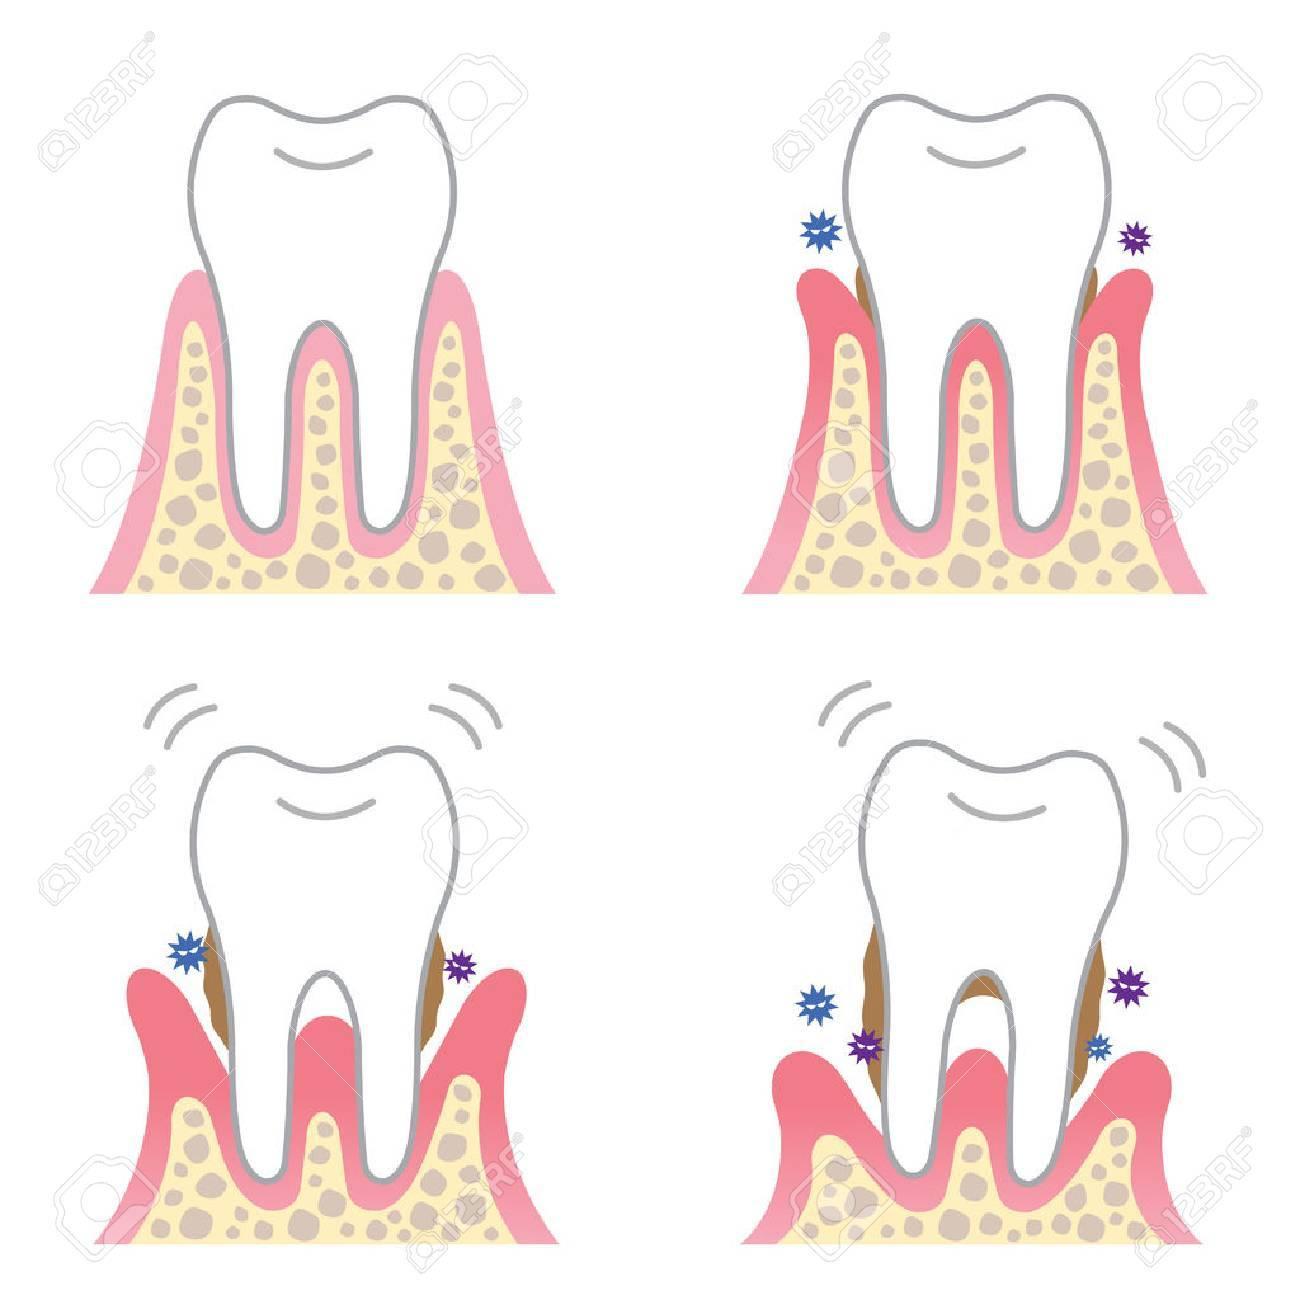 periodontal desease - 64624932